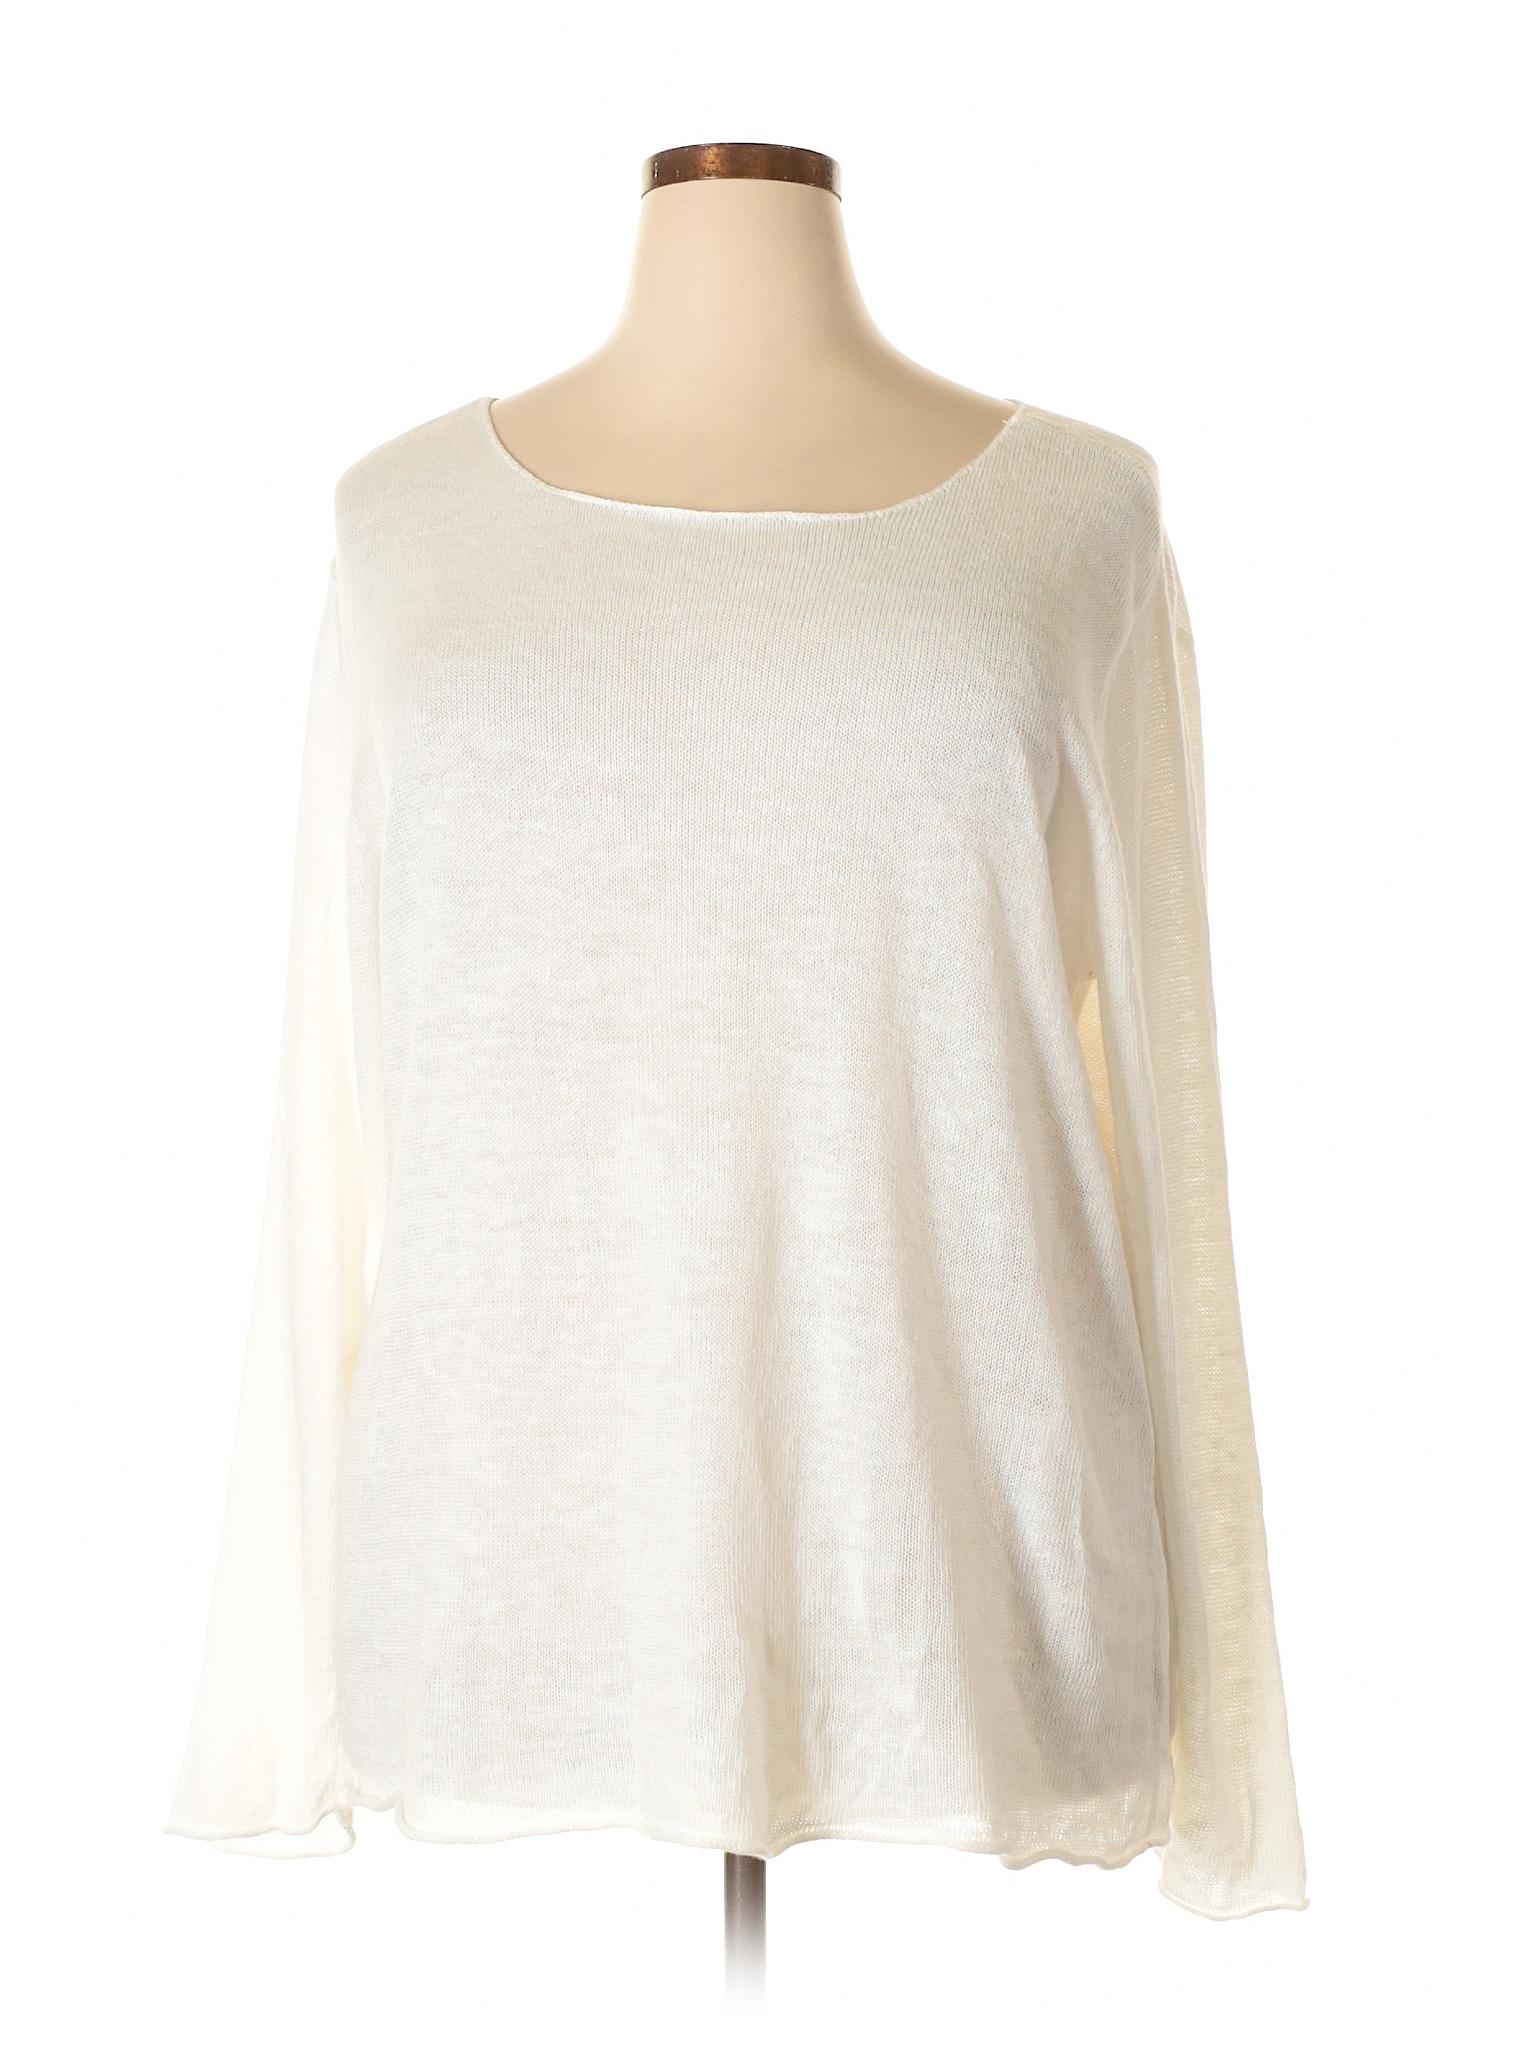 Boutique Fisher Pullover Sweater Eileen Boutique Eileen dYxawOpOtq